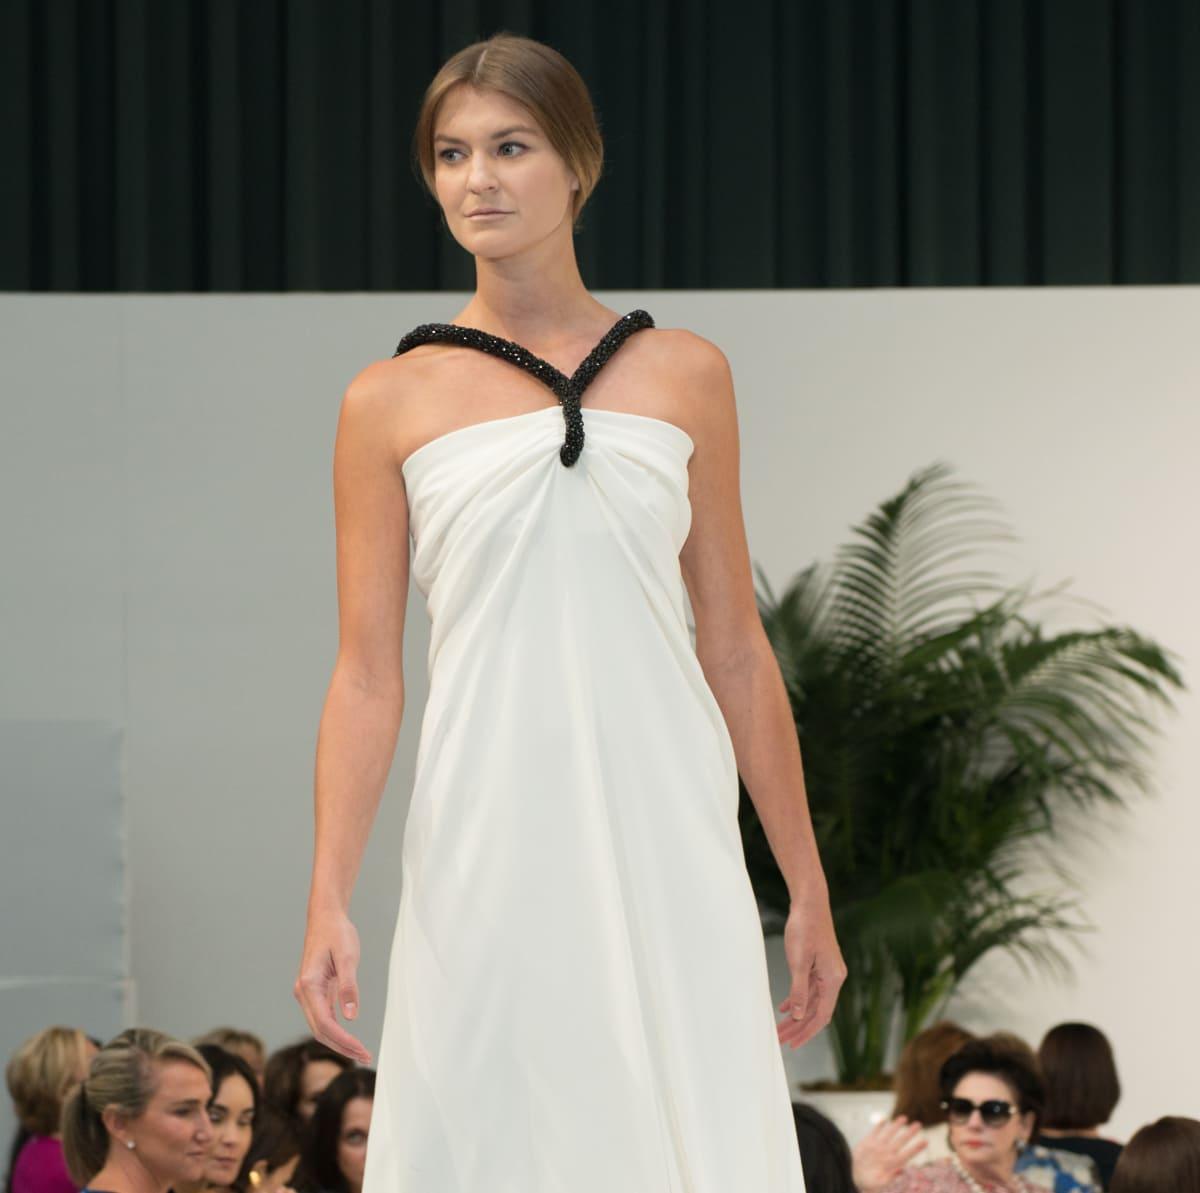 Oscar de la Renta 2018 resort collection white gown